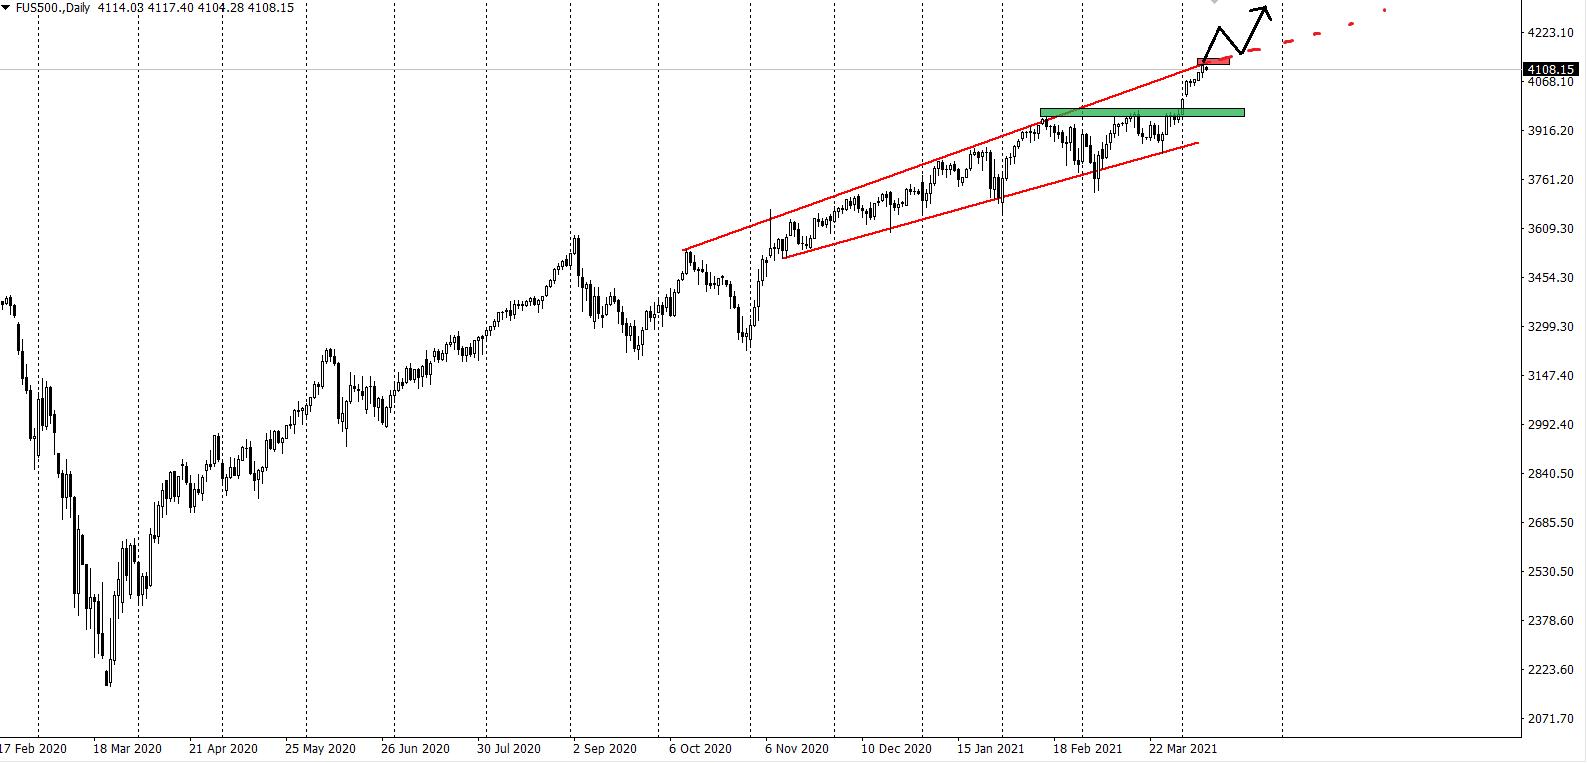 Index SP500 analýza